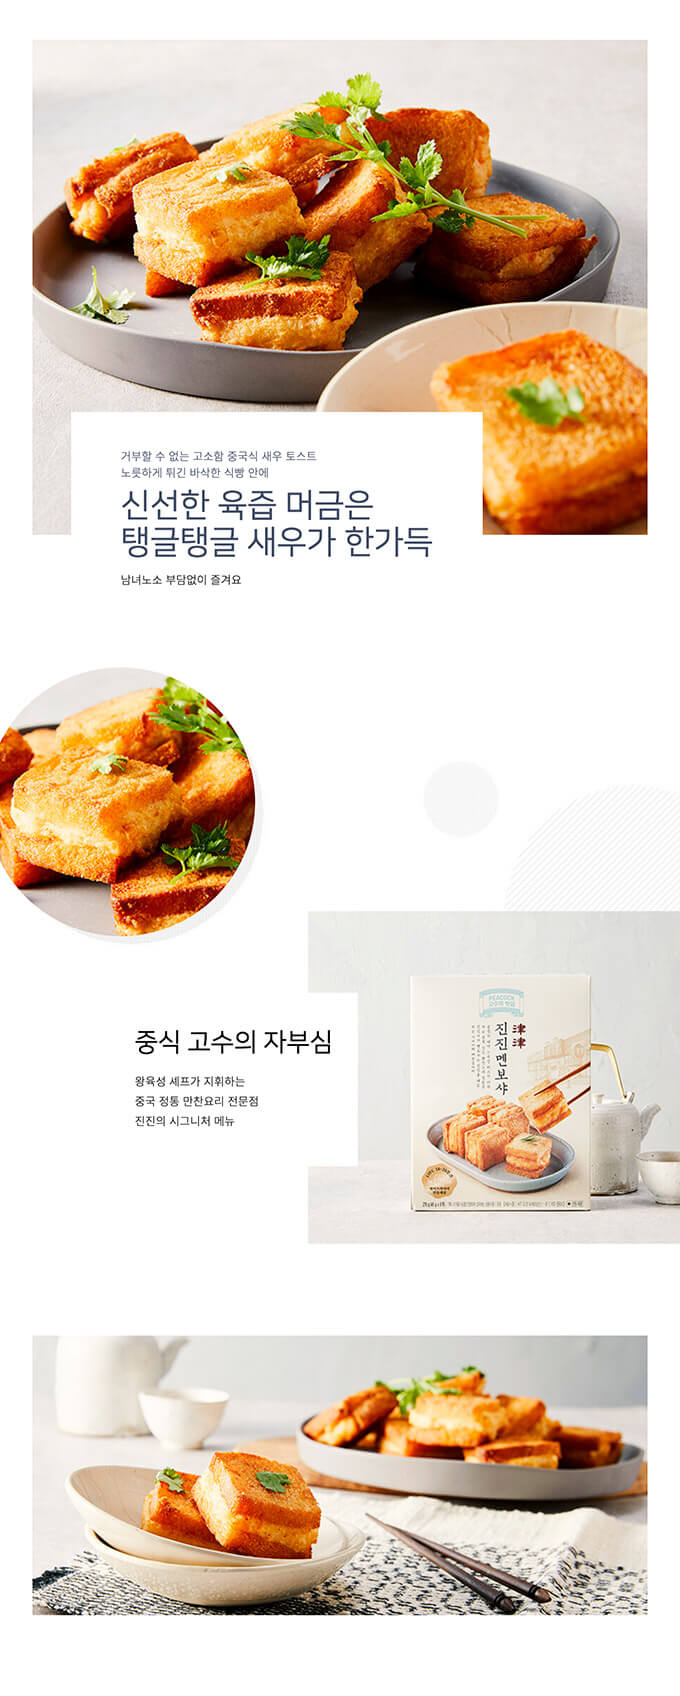 韓國食品-Peacock Mianbaoxia 275g